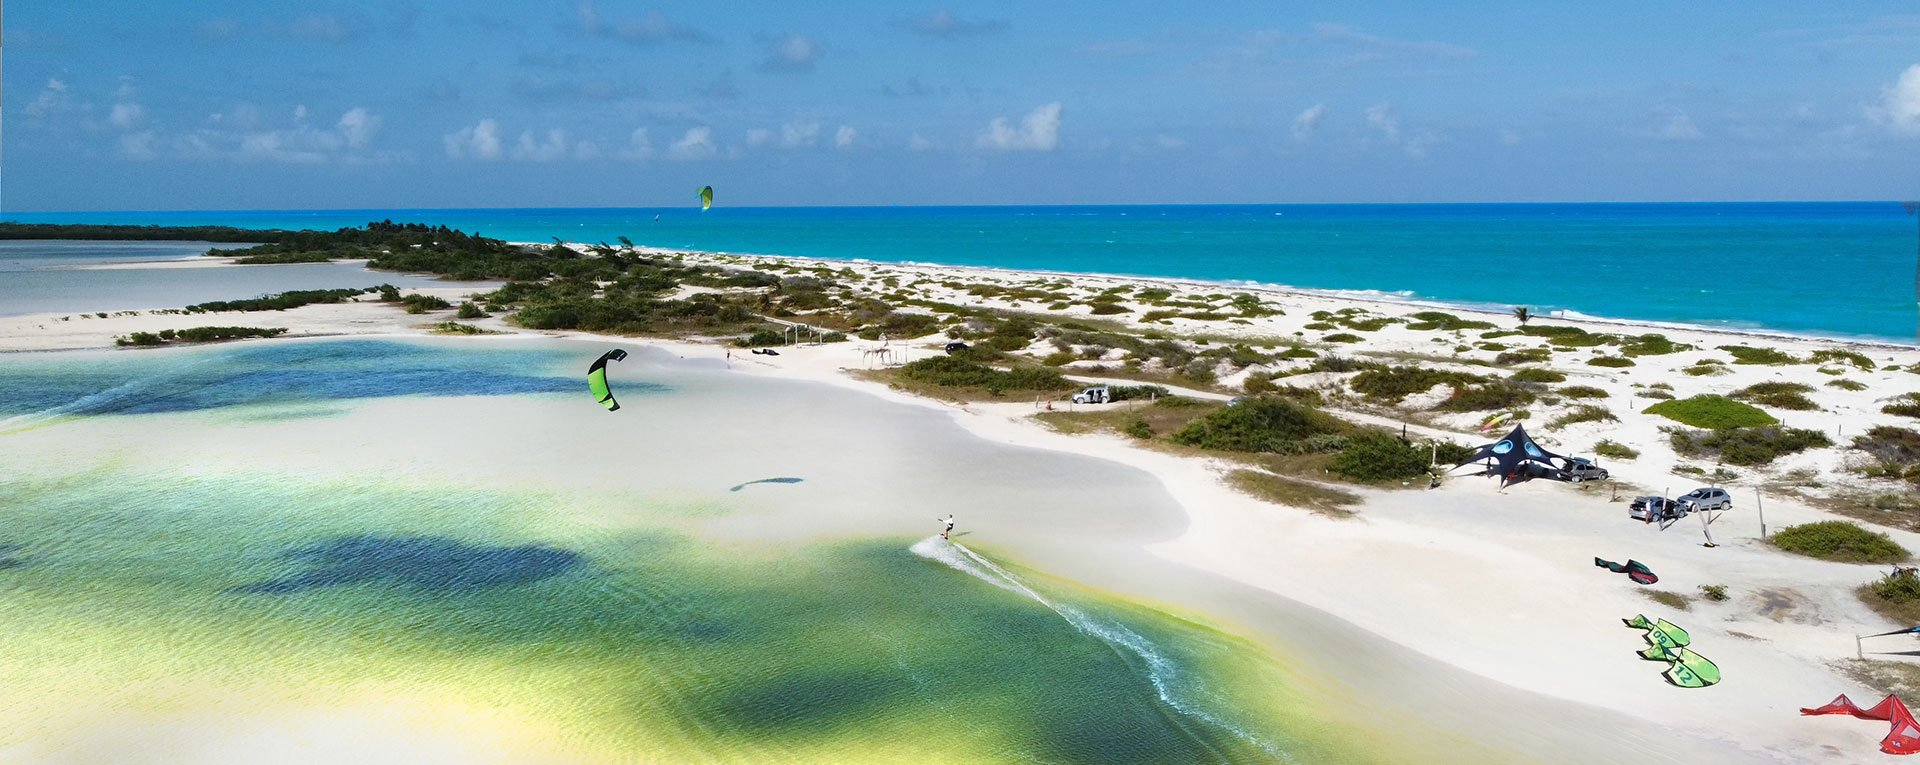 kiteboarding school Cancun